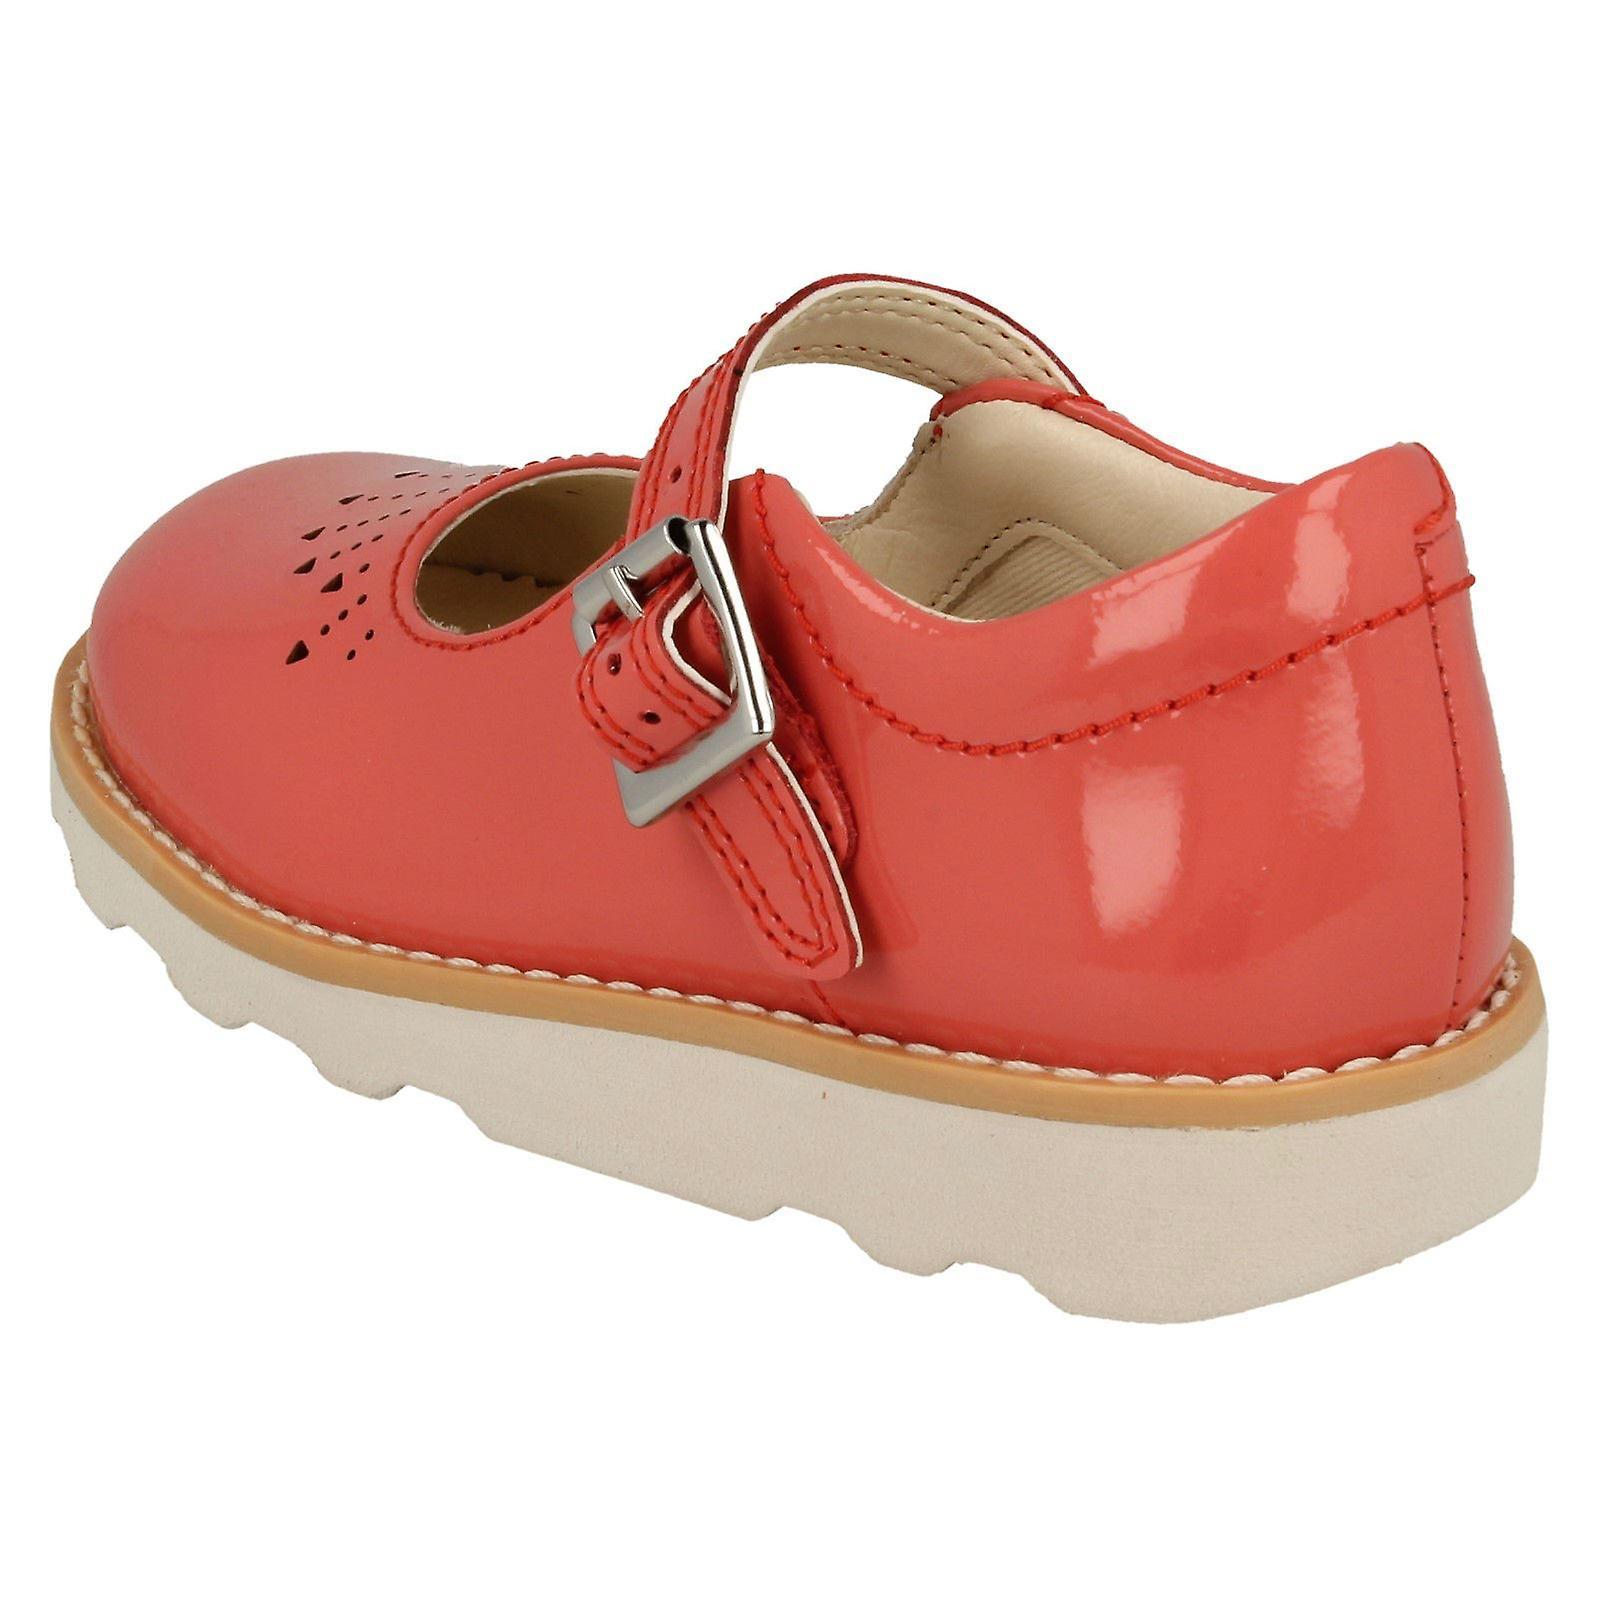 Ragazze Clarks scarpe Casual corona salta   Ordine Ordine Ordine economico    Sig/Sig Ra Scarpa  f4f661